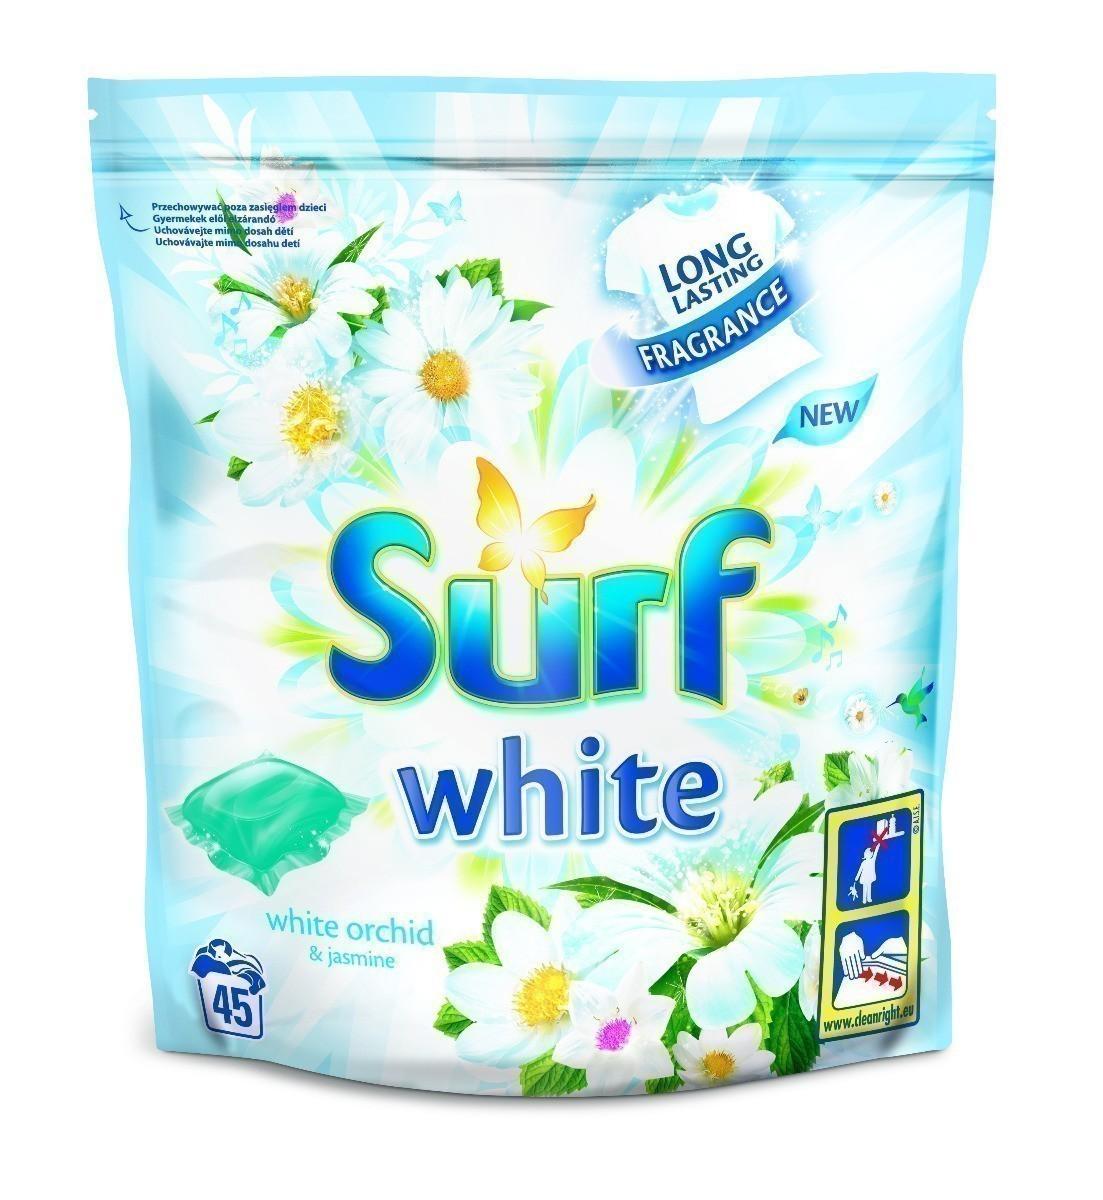 Surf White